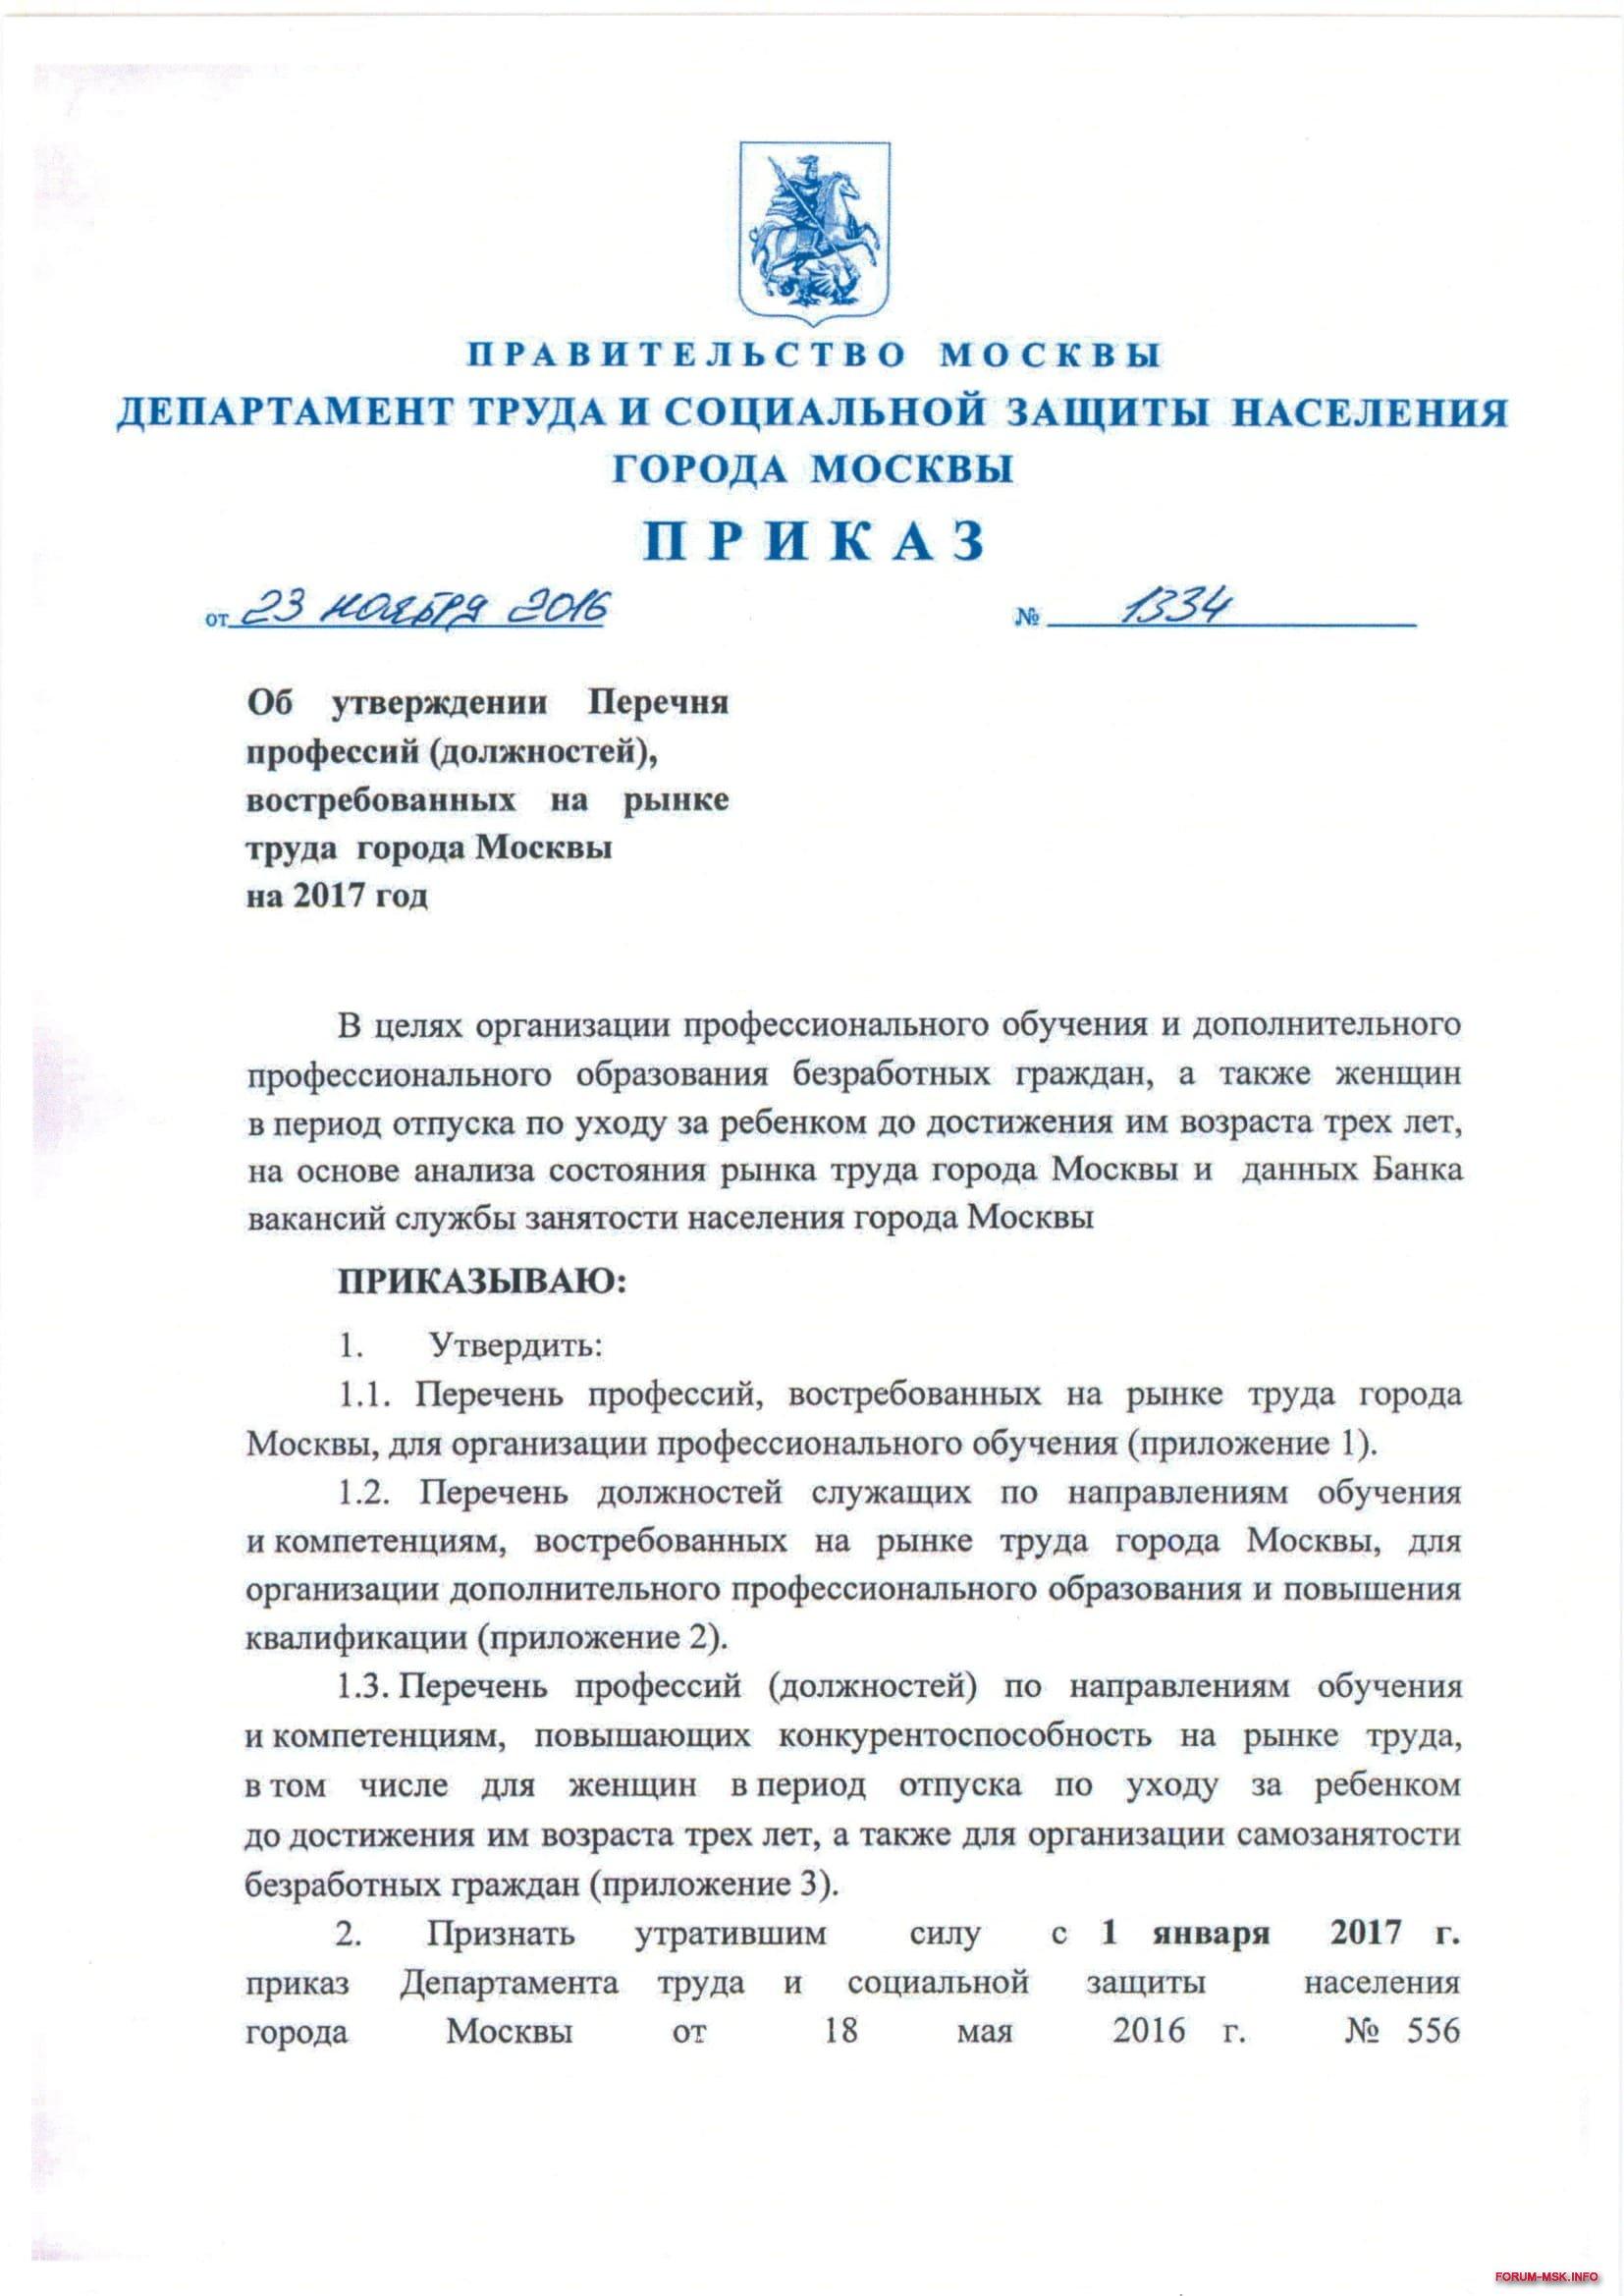 приказ дтсзн города москвы №1334-01.jpg